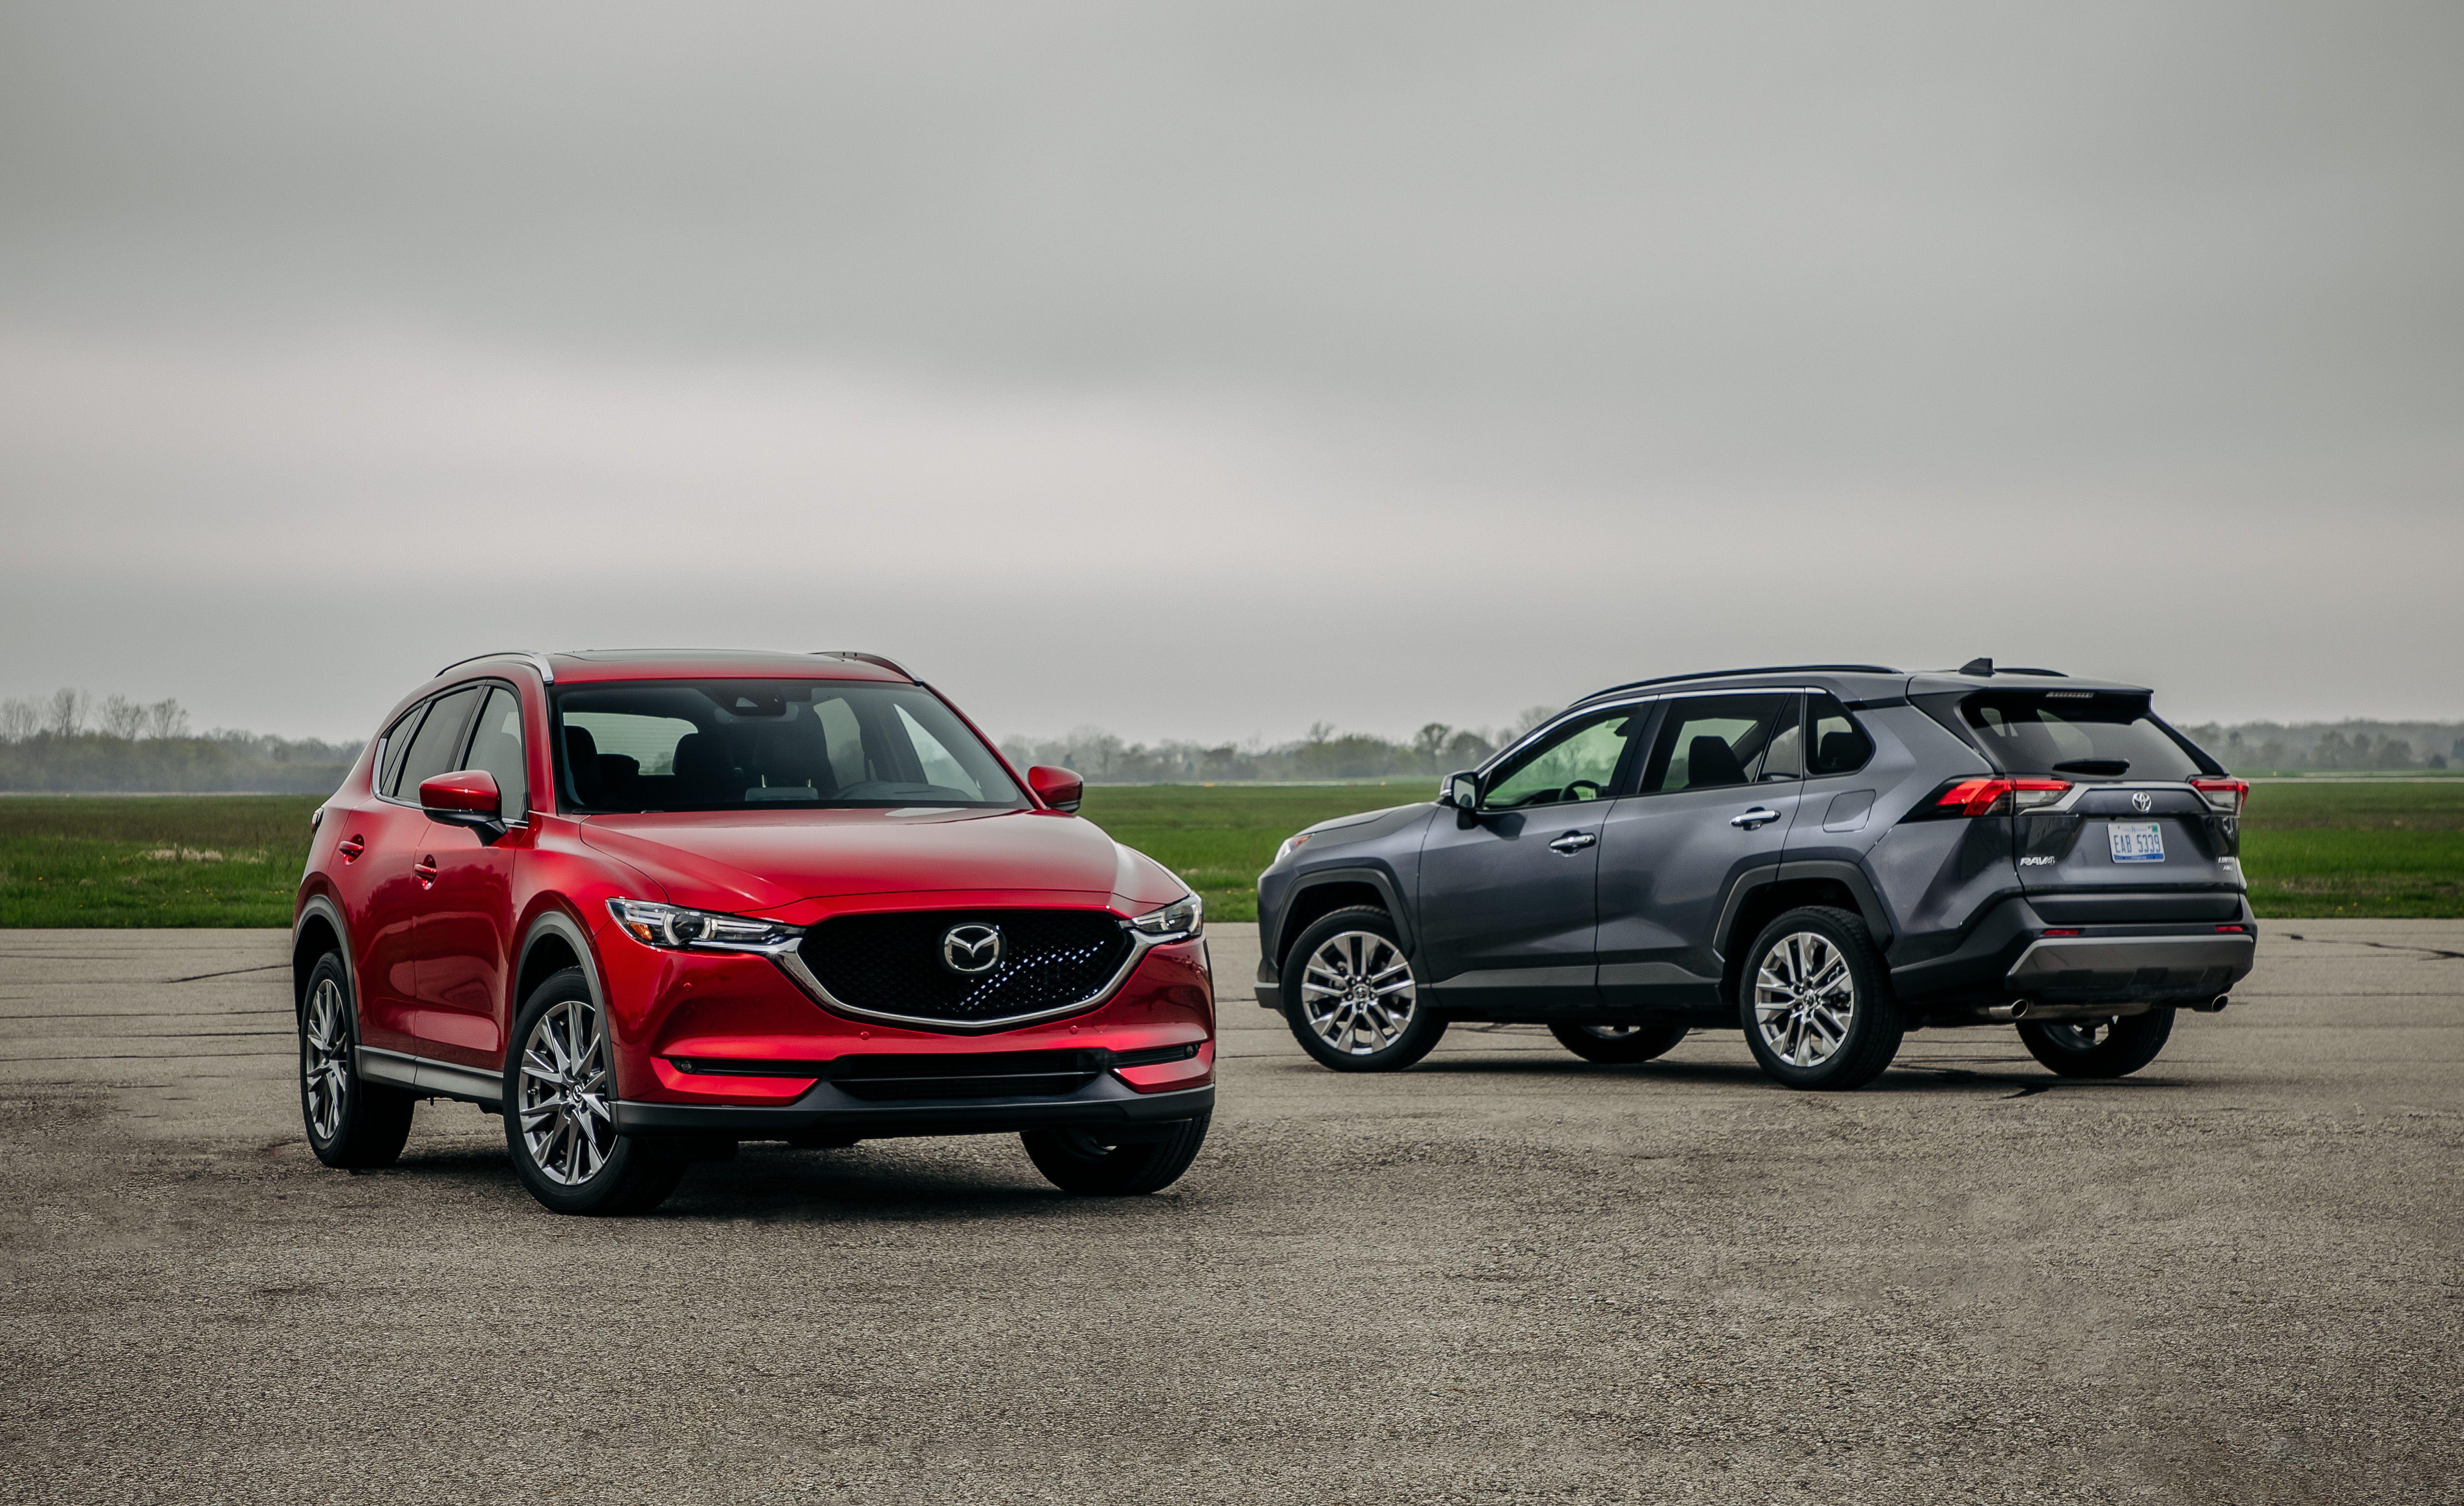 Rav4 Gas Mileage >> 2019 Mazda Cx 5 Vs 2019 Toyota Rav4 Which Is The Better